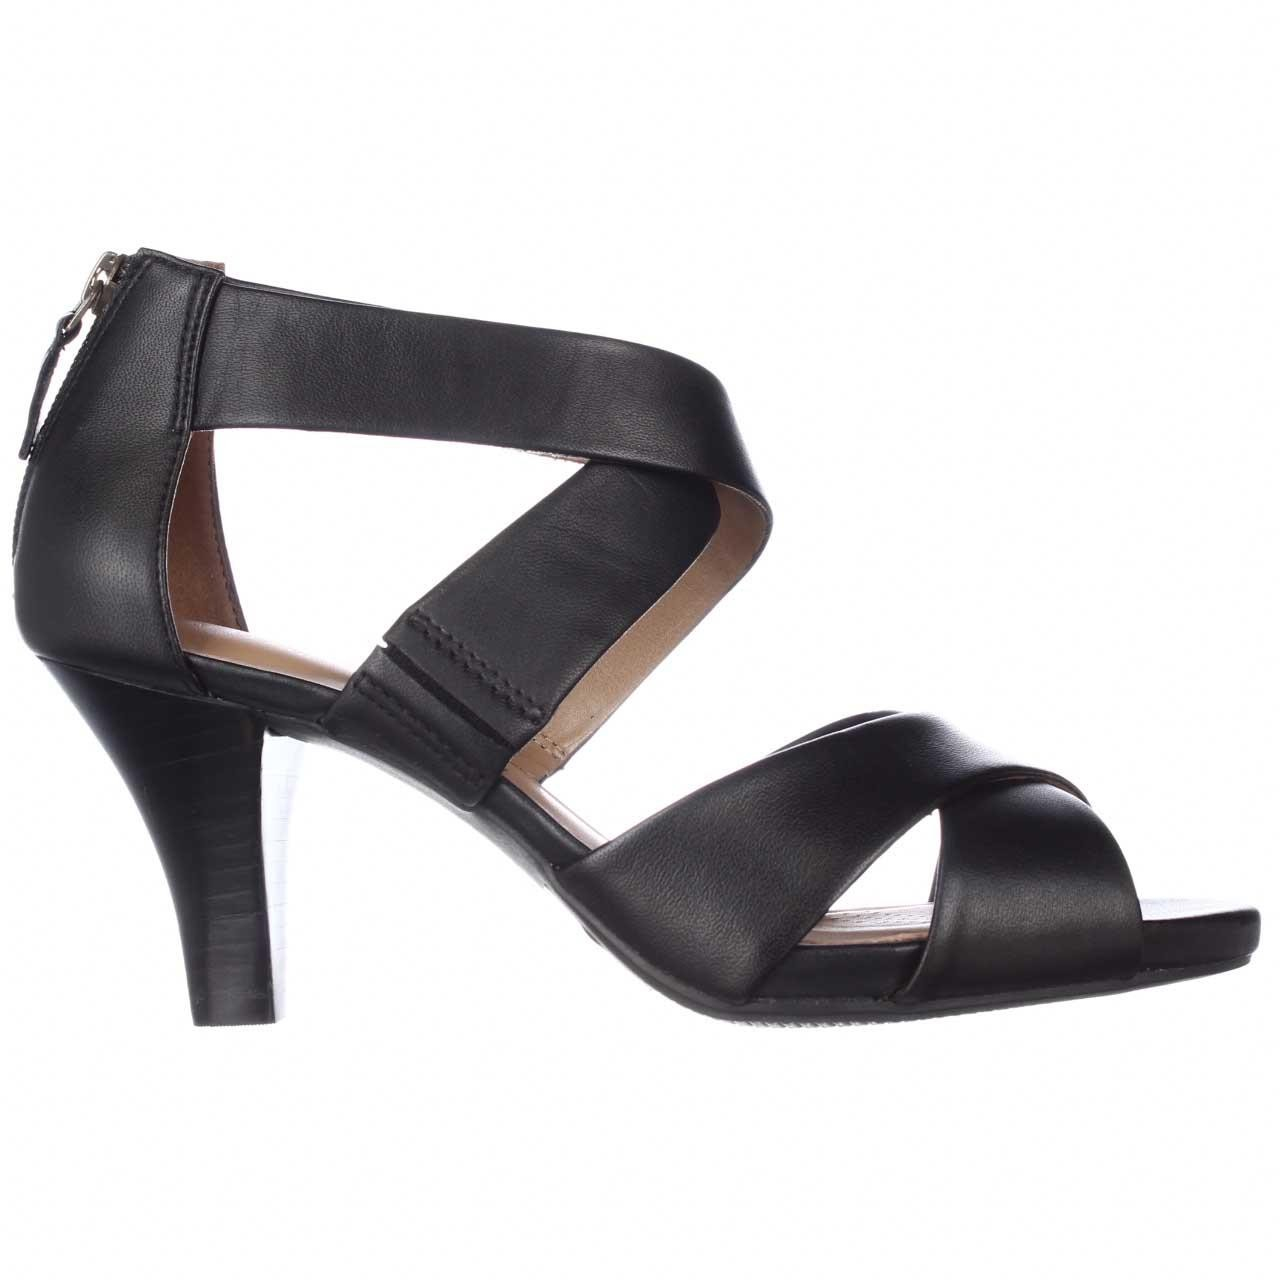 Clarks Florine Sashae Strappy Dress Sandals In Natural Lyst